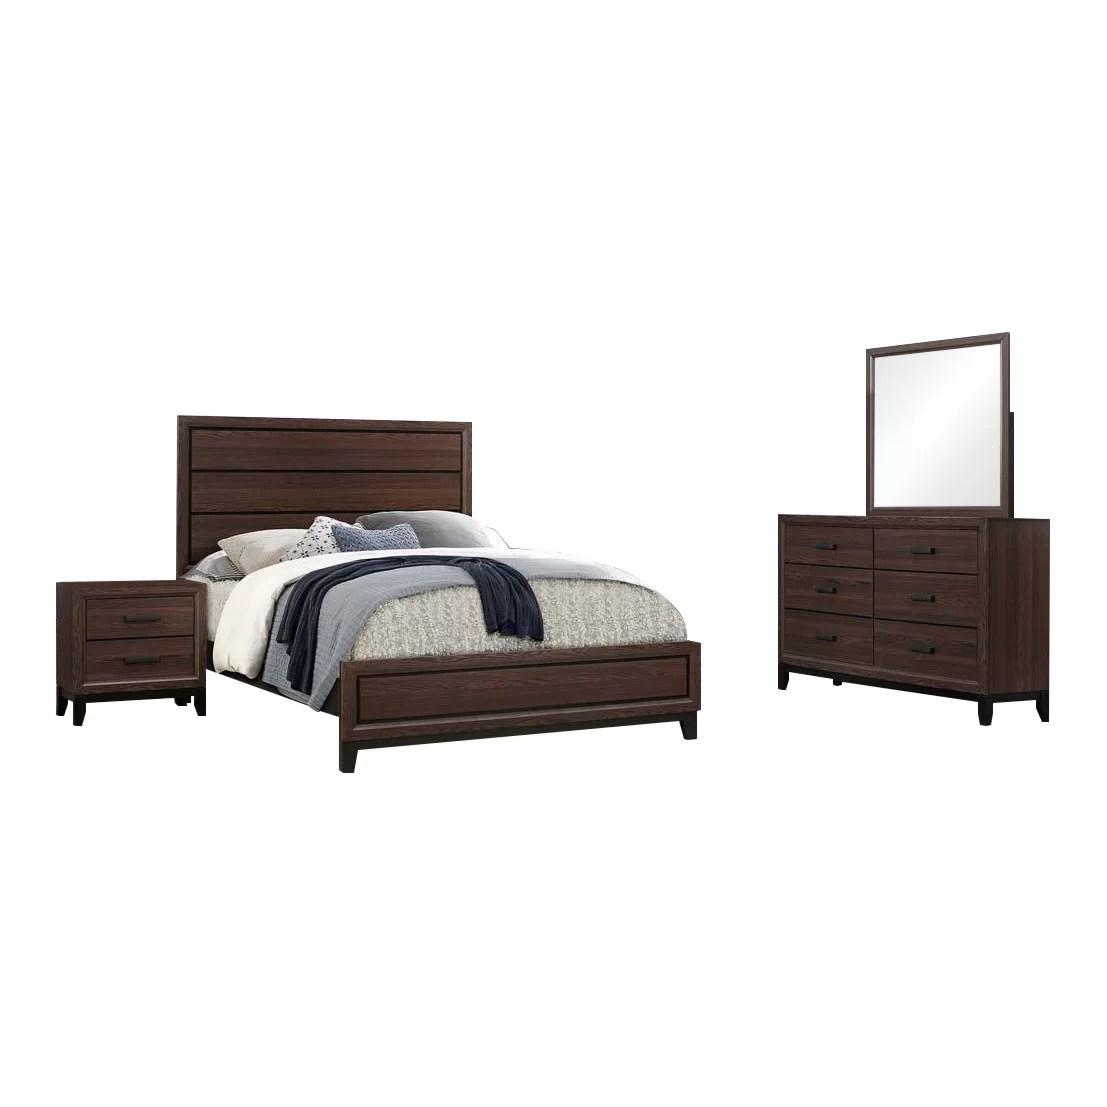 wallis standard configurable bedroom set